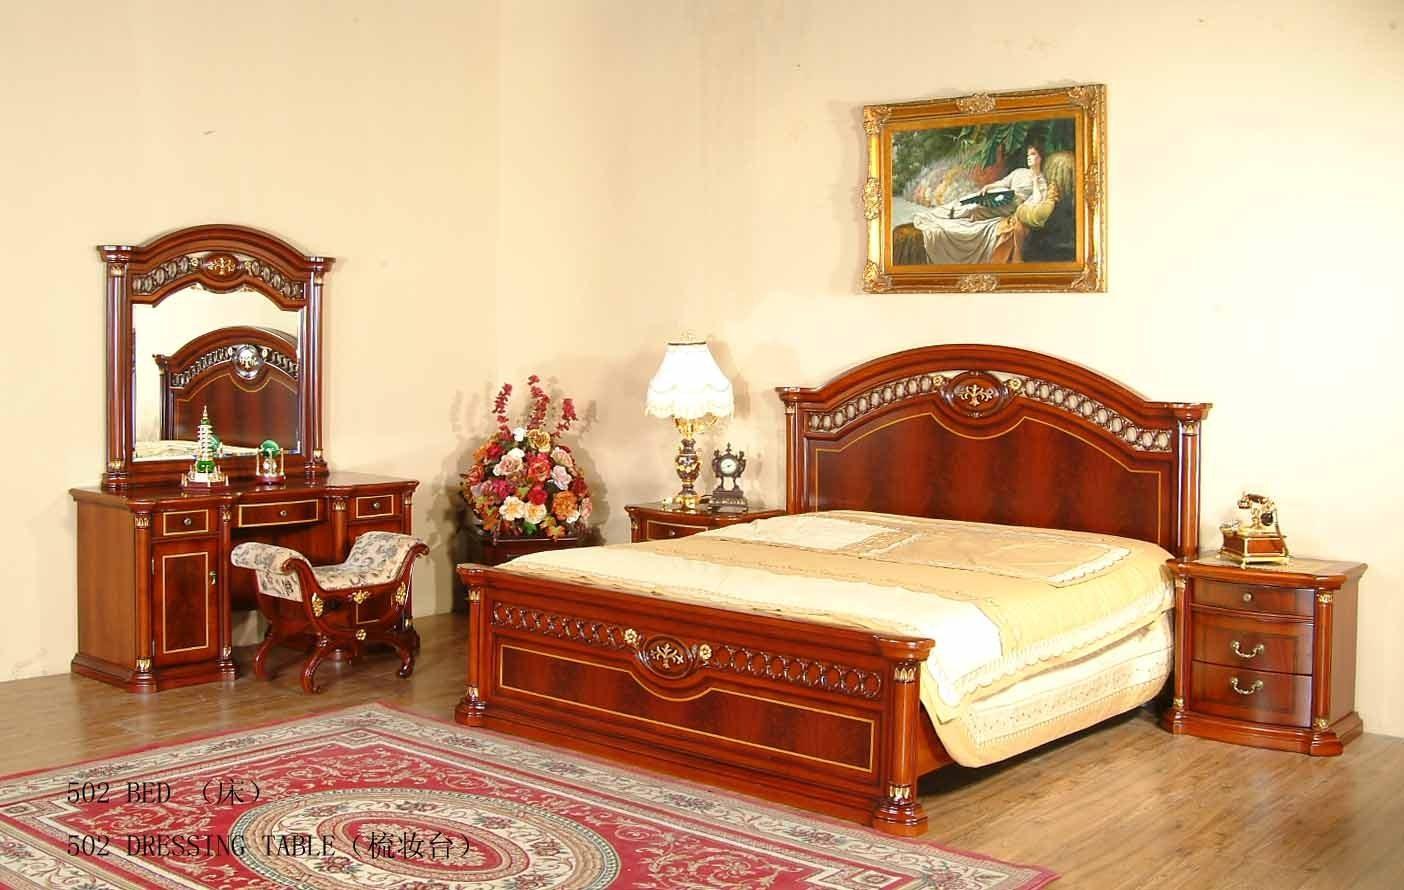 bedroom furniture black friday hawk haven bedroom furniture sets without bed bedroom furniture sets with bed and desk